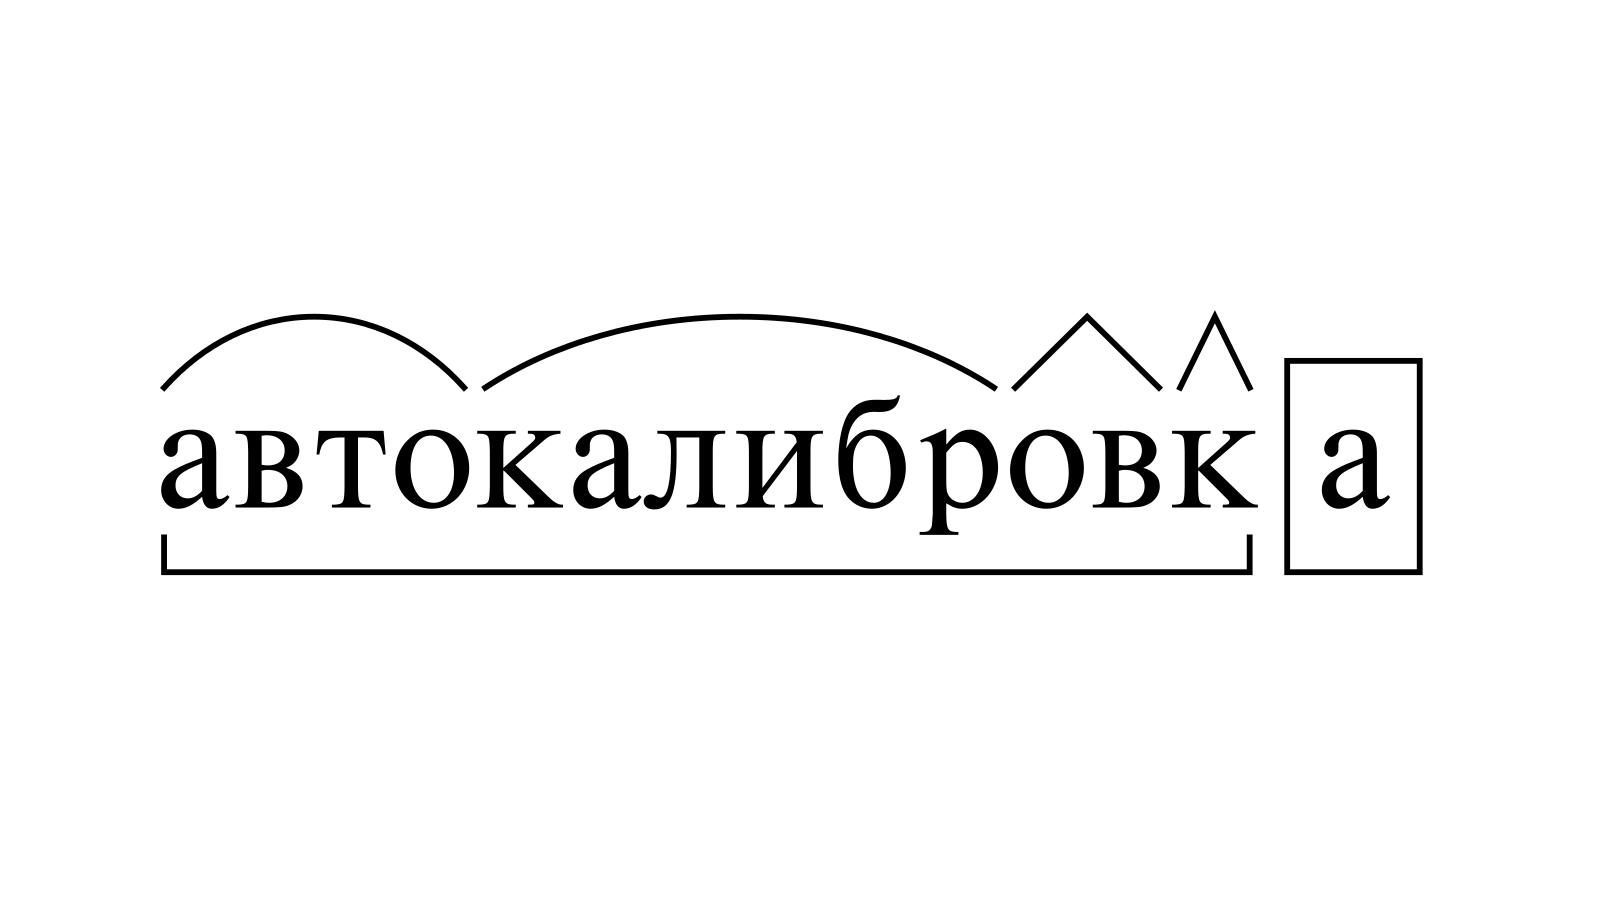 Разбор слова «автокалибровка» по составу